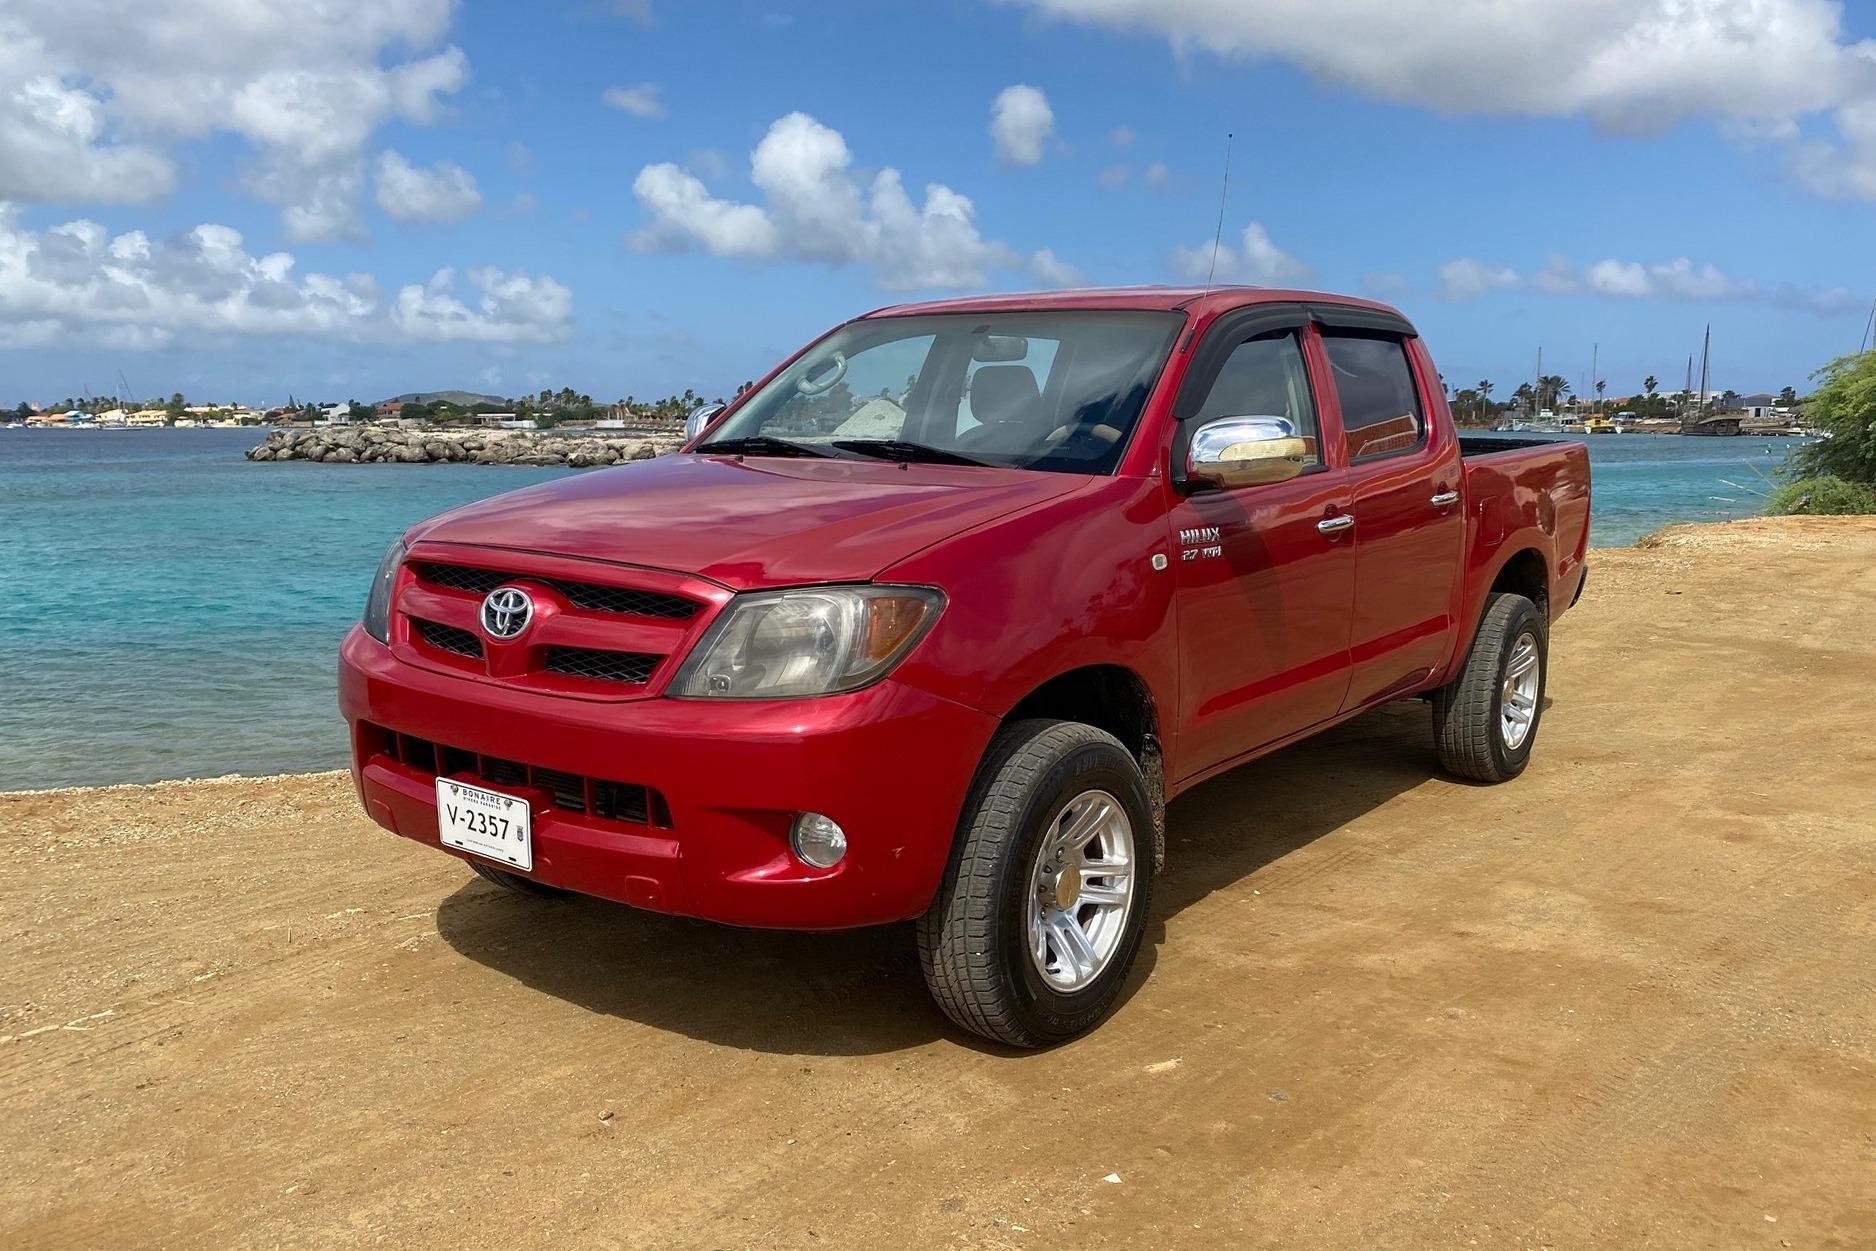 Tropical car rental Bonaire - Toyota Hilux rood te huur - front